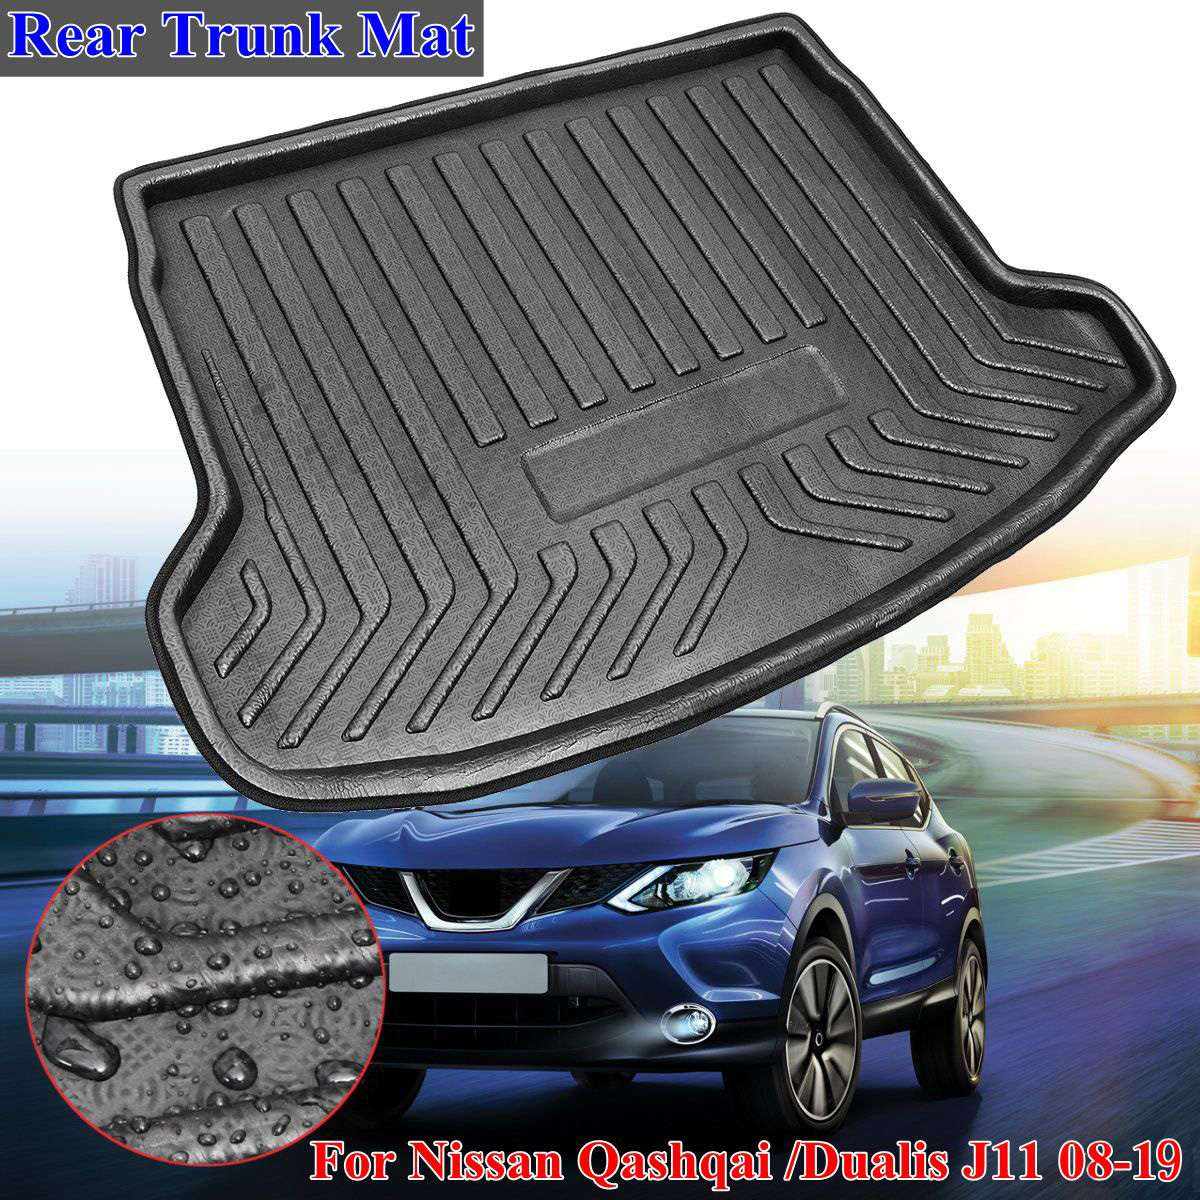 Tray Boot Liner Cargo Rear Trunk Cargo Mat Floor Carpet Mud Kick For Nissan Qashqai Dualis J11 2008-2015 2016 2017 2018 2019